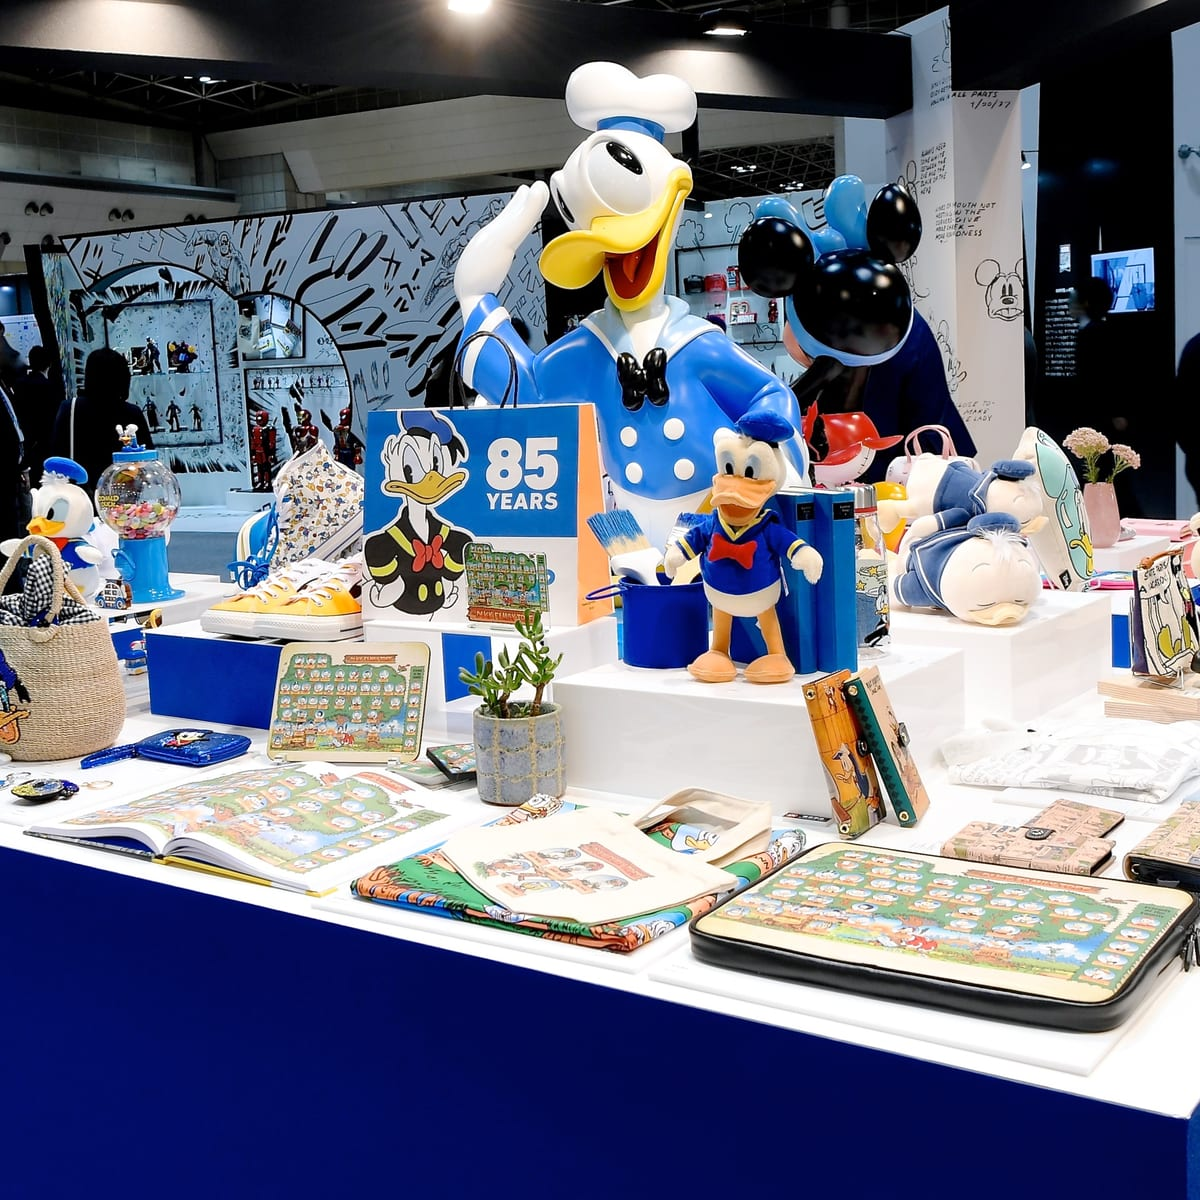 DISNEY EXPO JAPAN 2019 ディズニー「ドナルドダック」グッズ